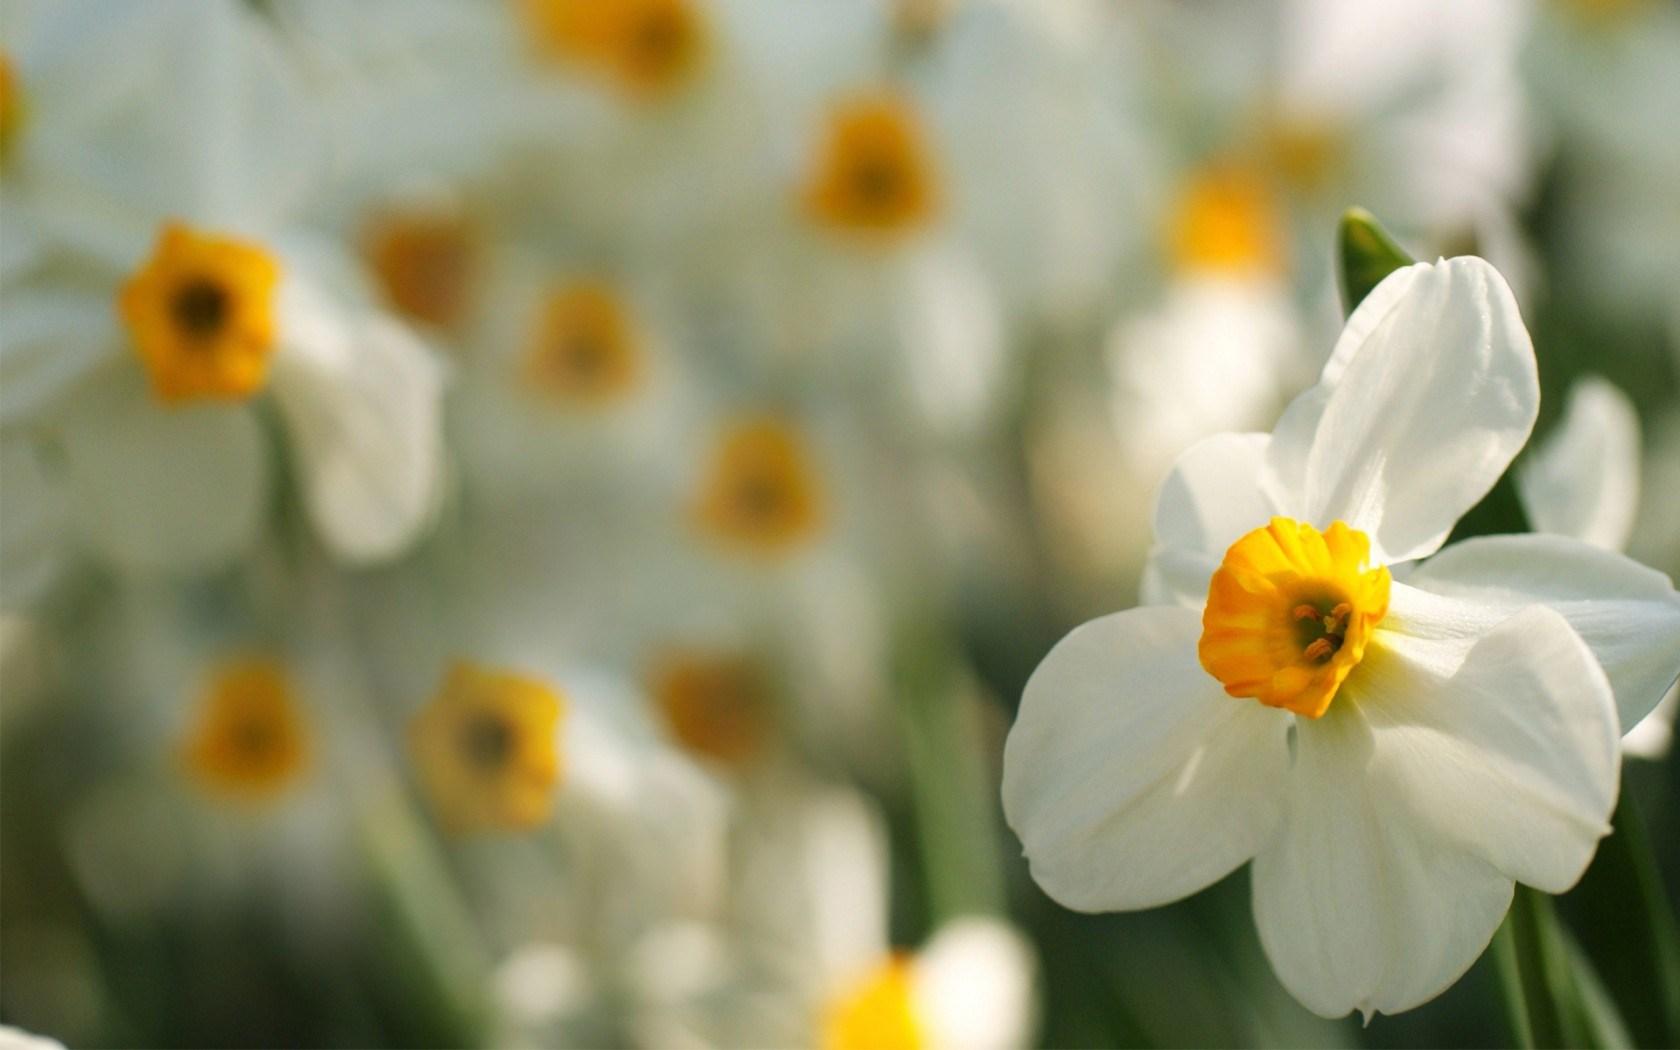 Daffodils Flowers Macro Focus Blur